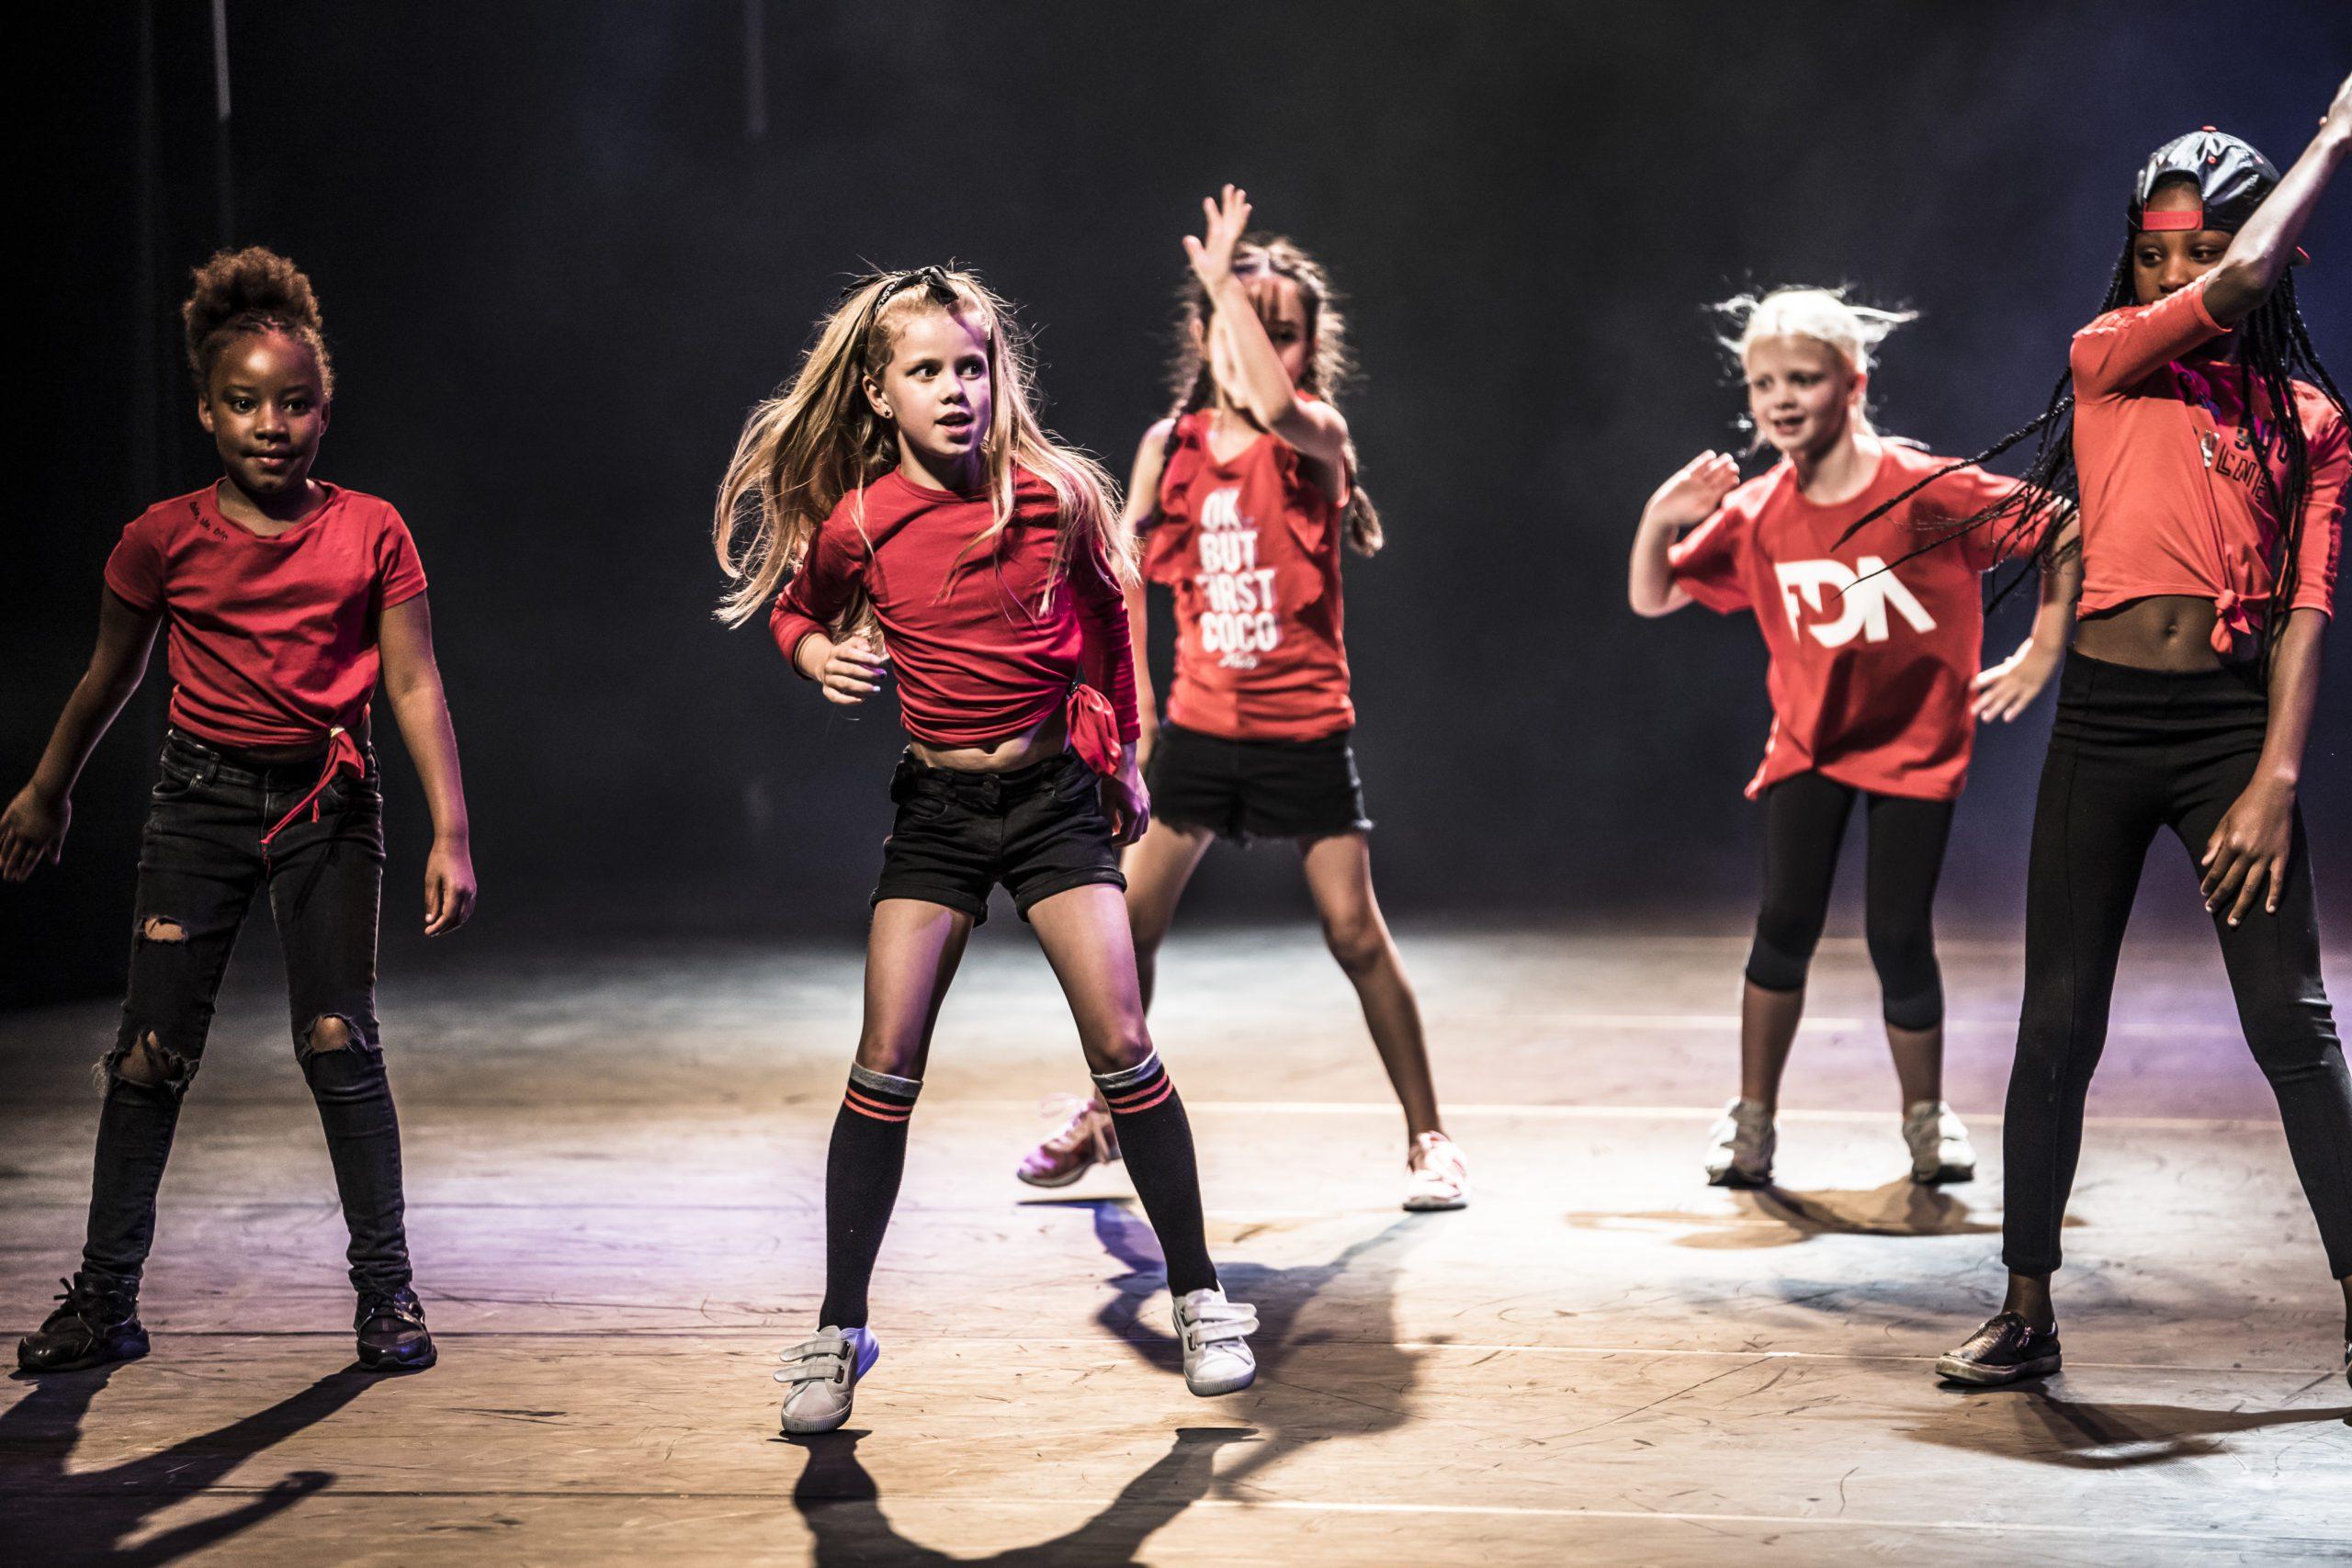 Flexx_n Dance Academy Kids Dansles